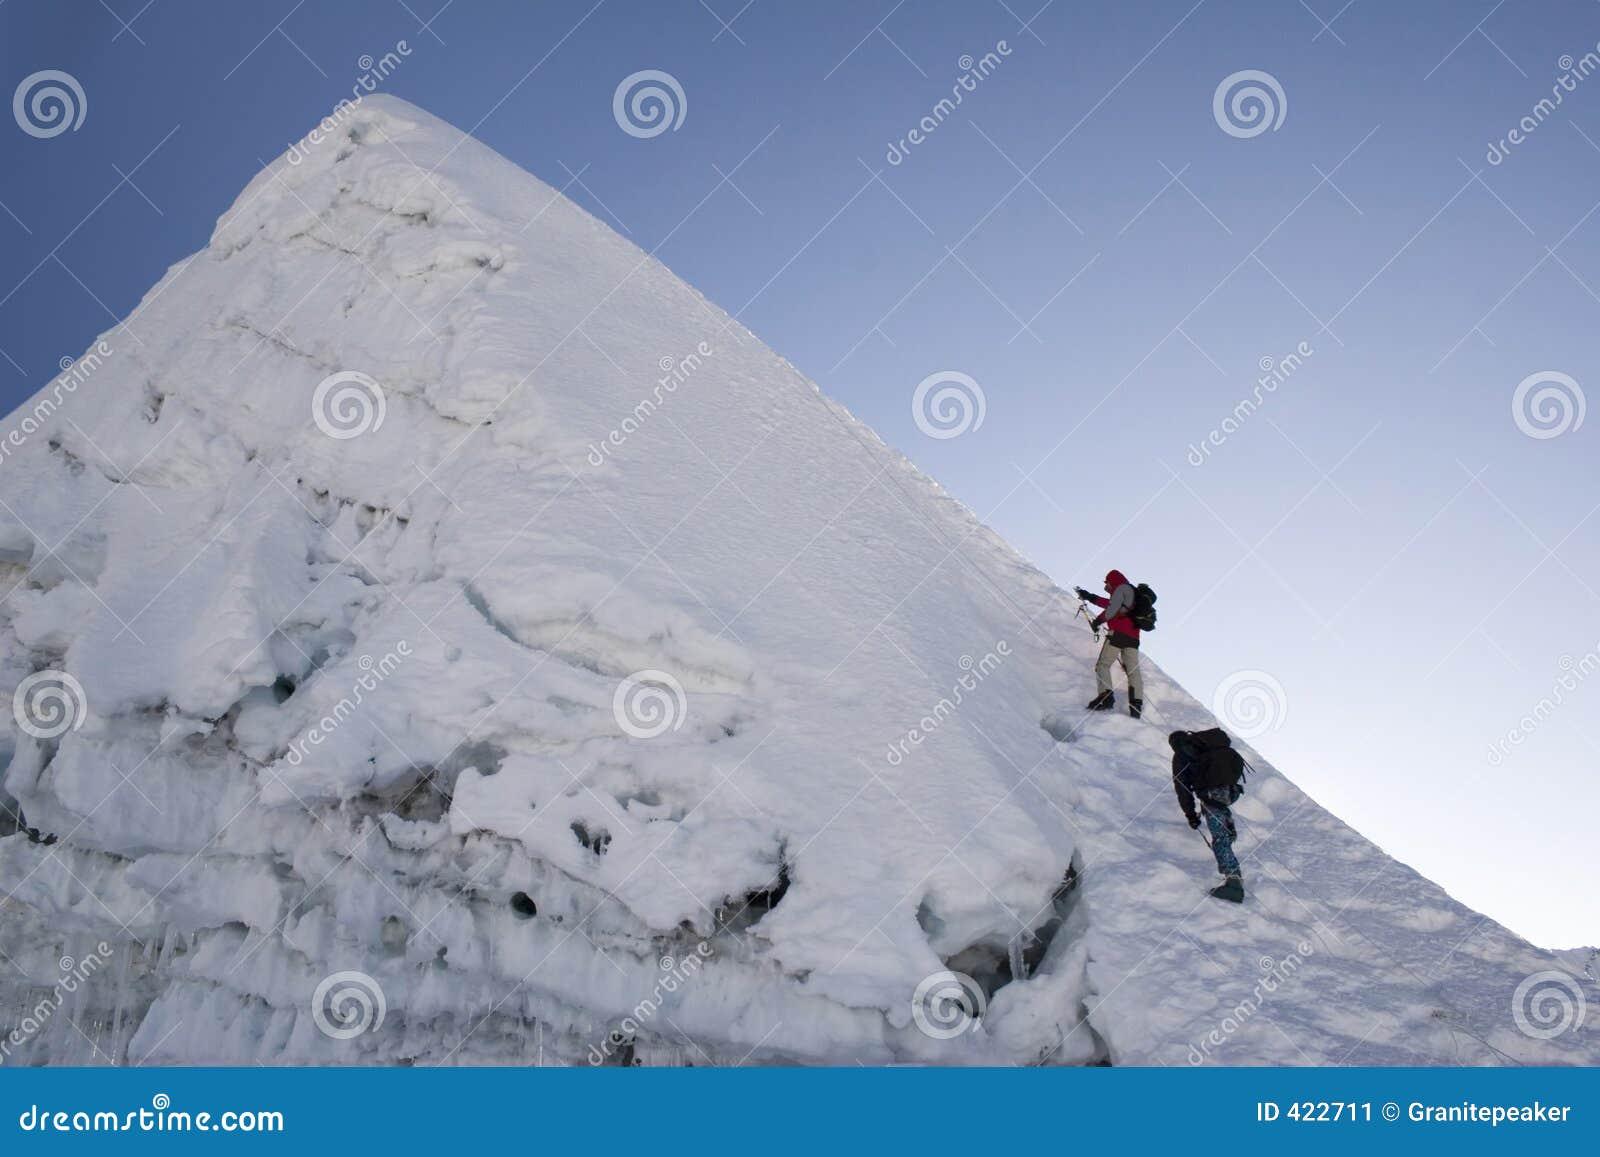 Download Island Peak Summit - Nepal stock image. Image of sagarmatha - 422711